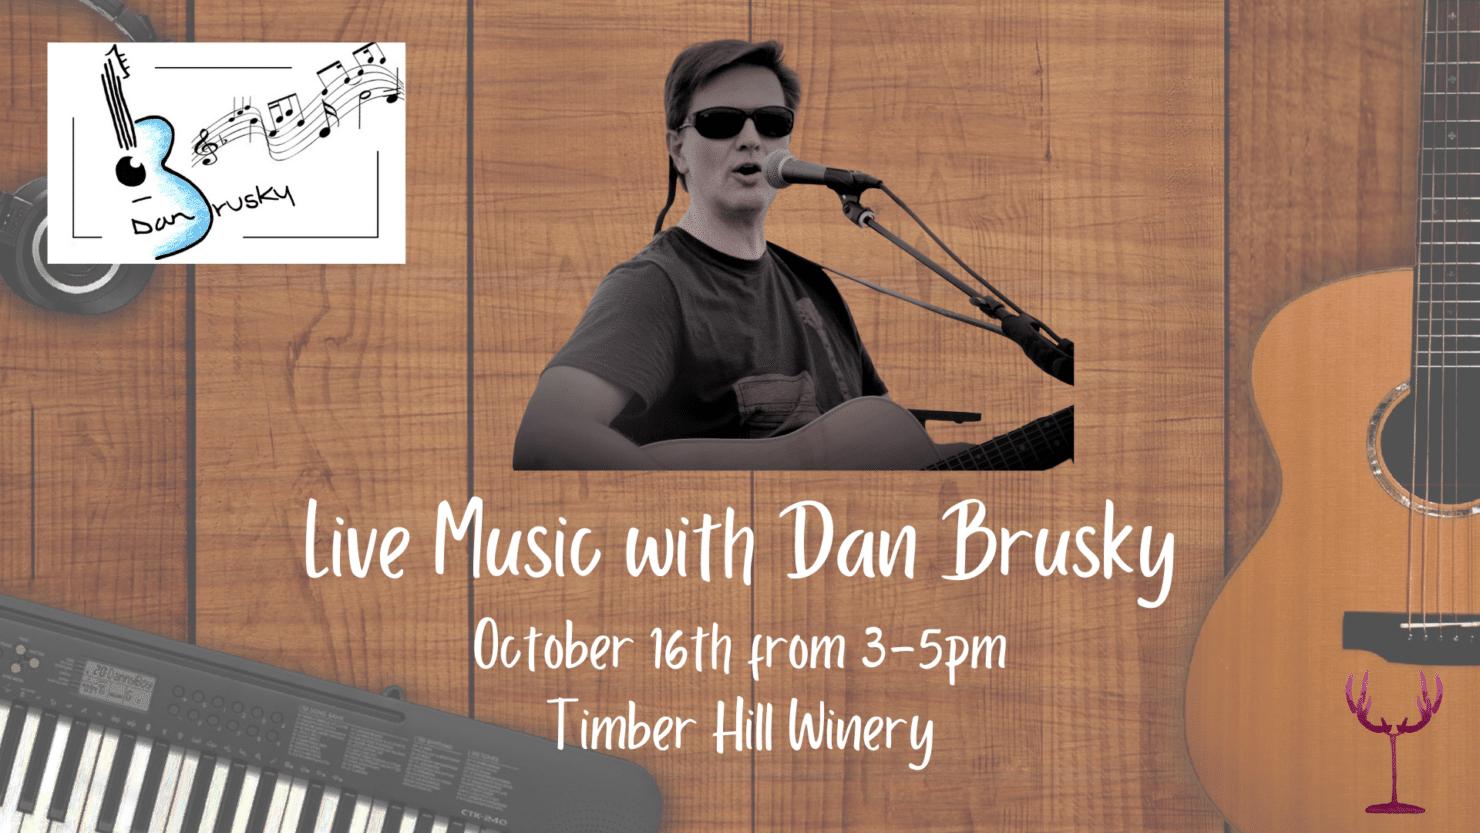 Live Music with Dan Brusky